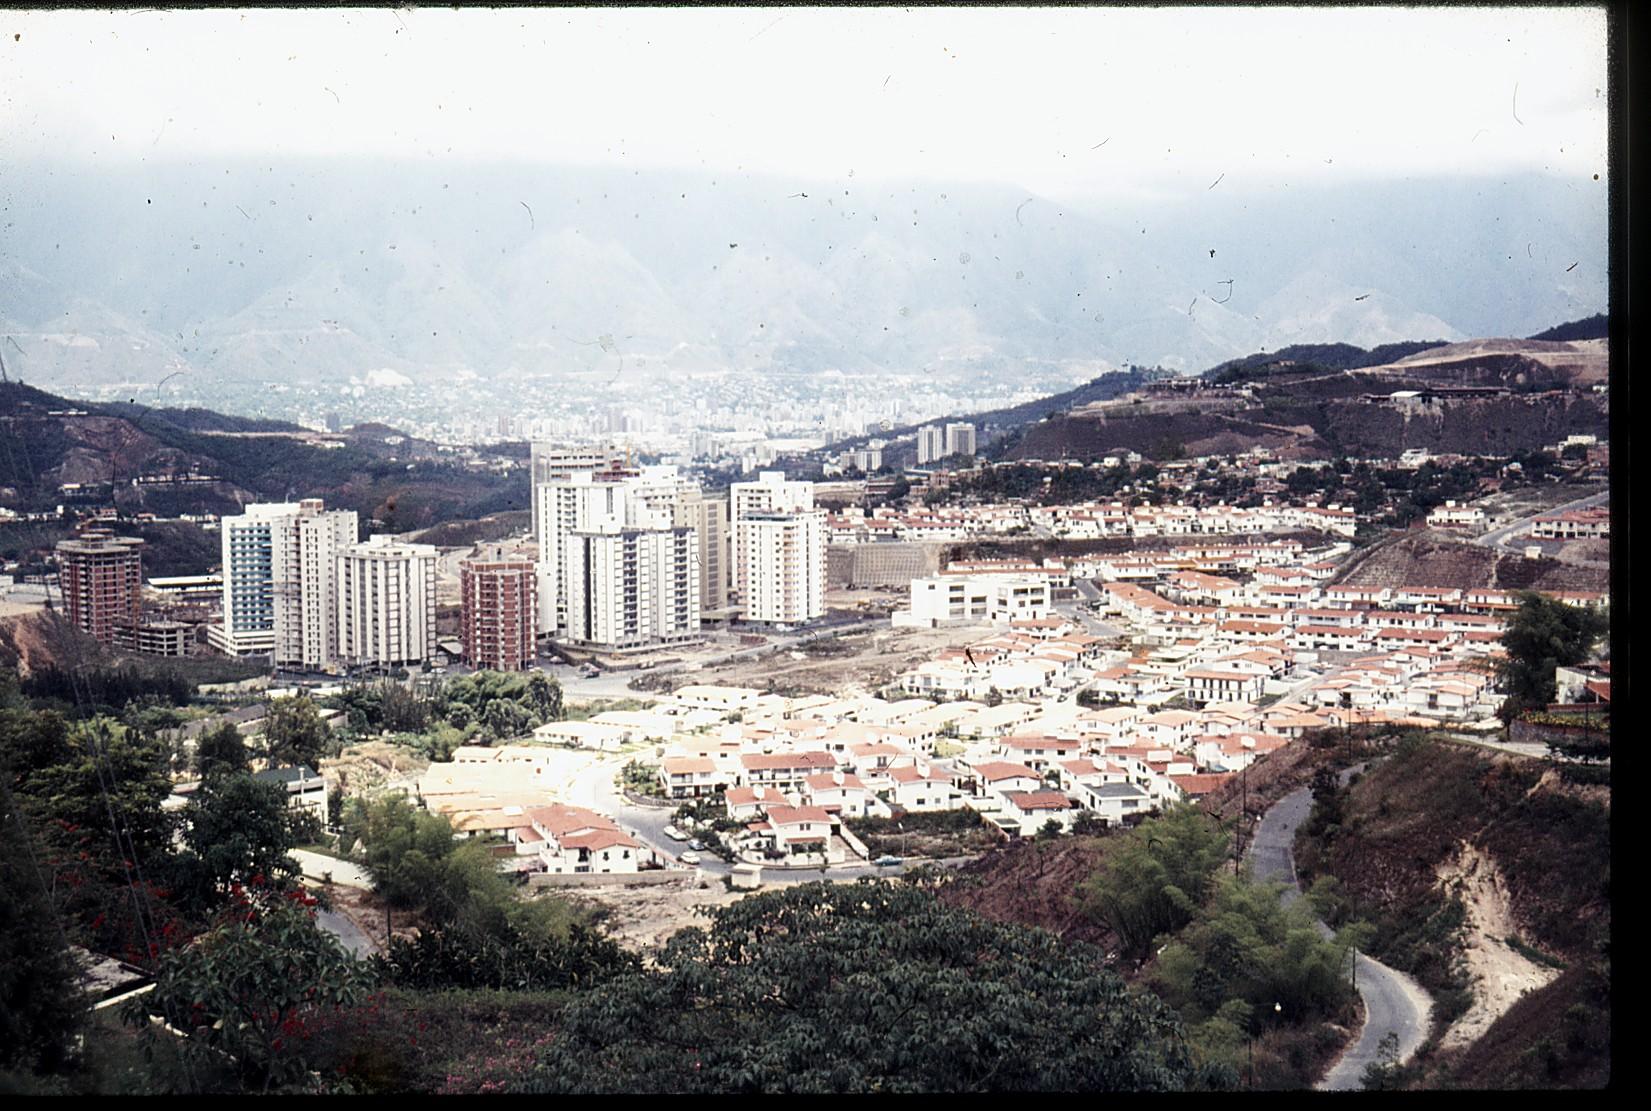 southamerica1972-1